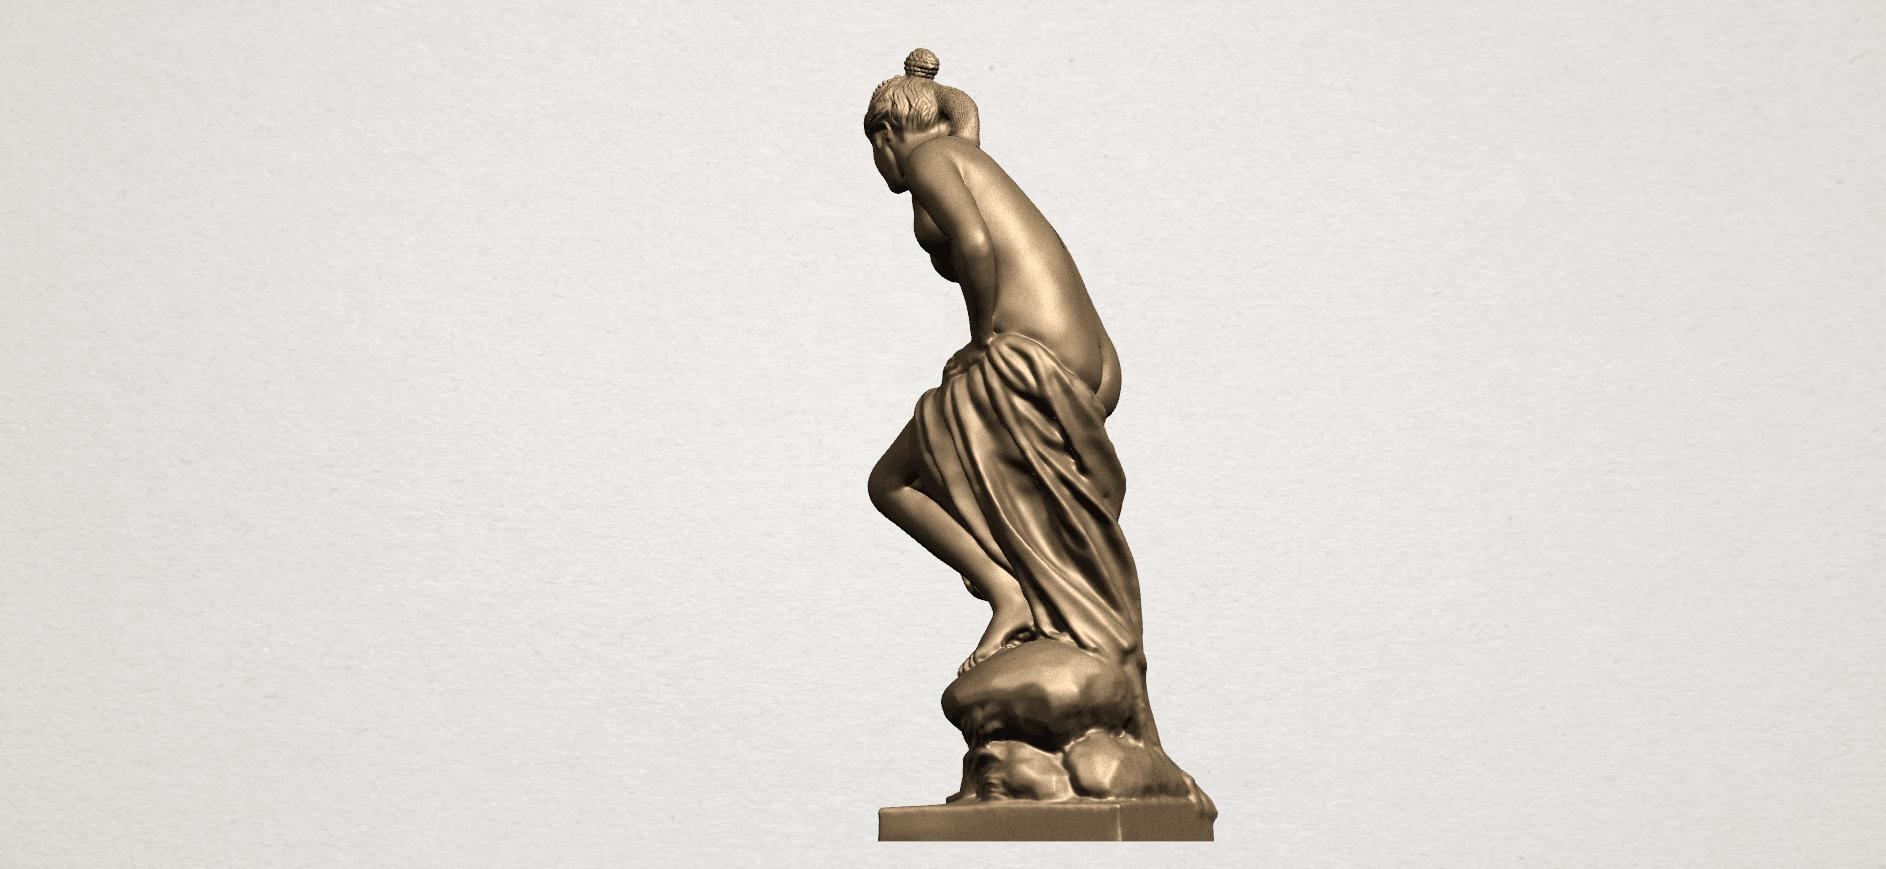 Naked Girl (iv) A03.png Download free STL file Naked Girl 04 • 3D print design, GeorgesNikkei